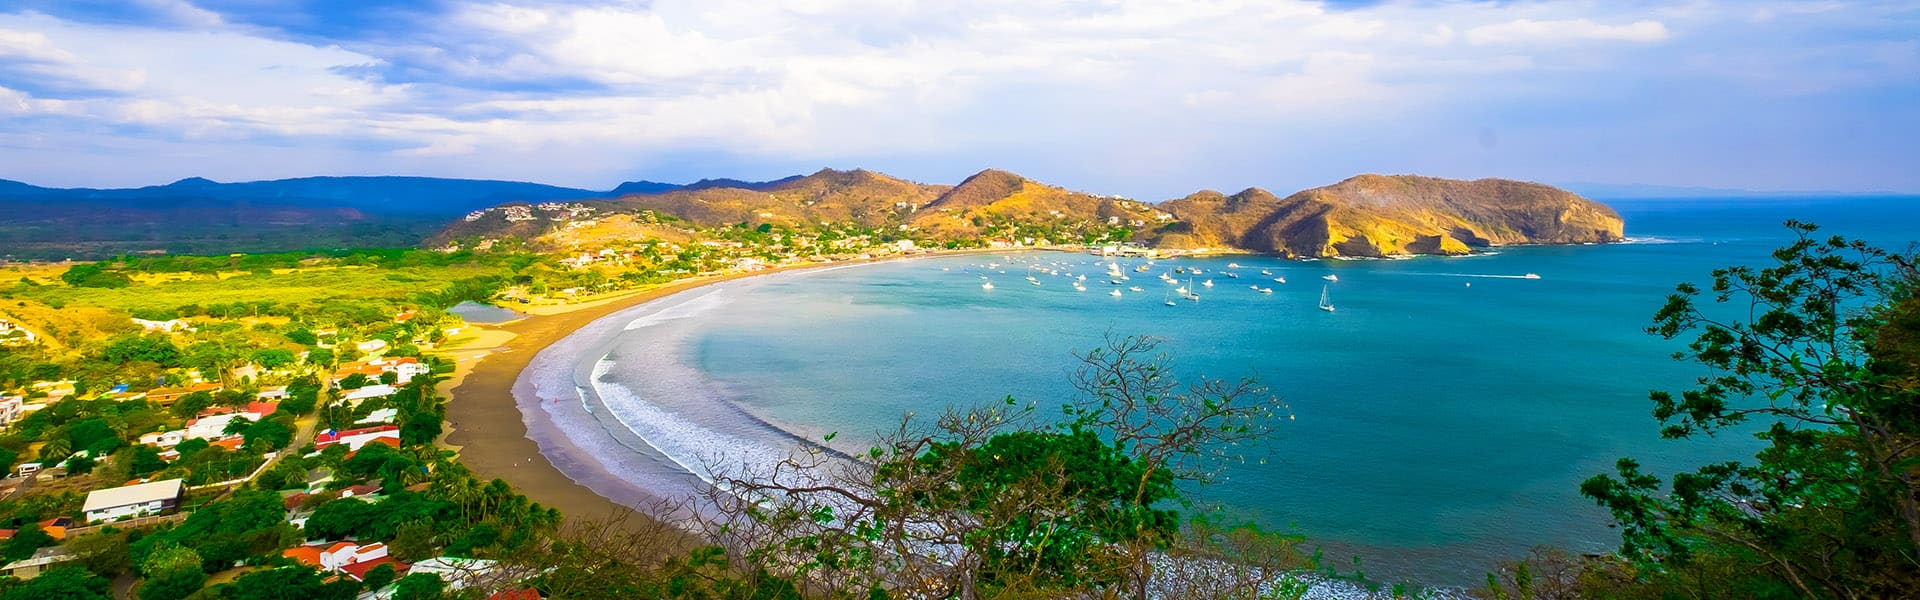 Canal dePanama  :  Cabo etPuerto Vallarta